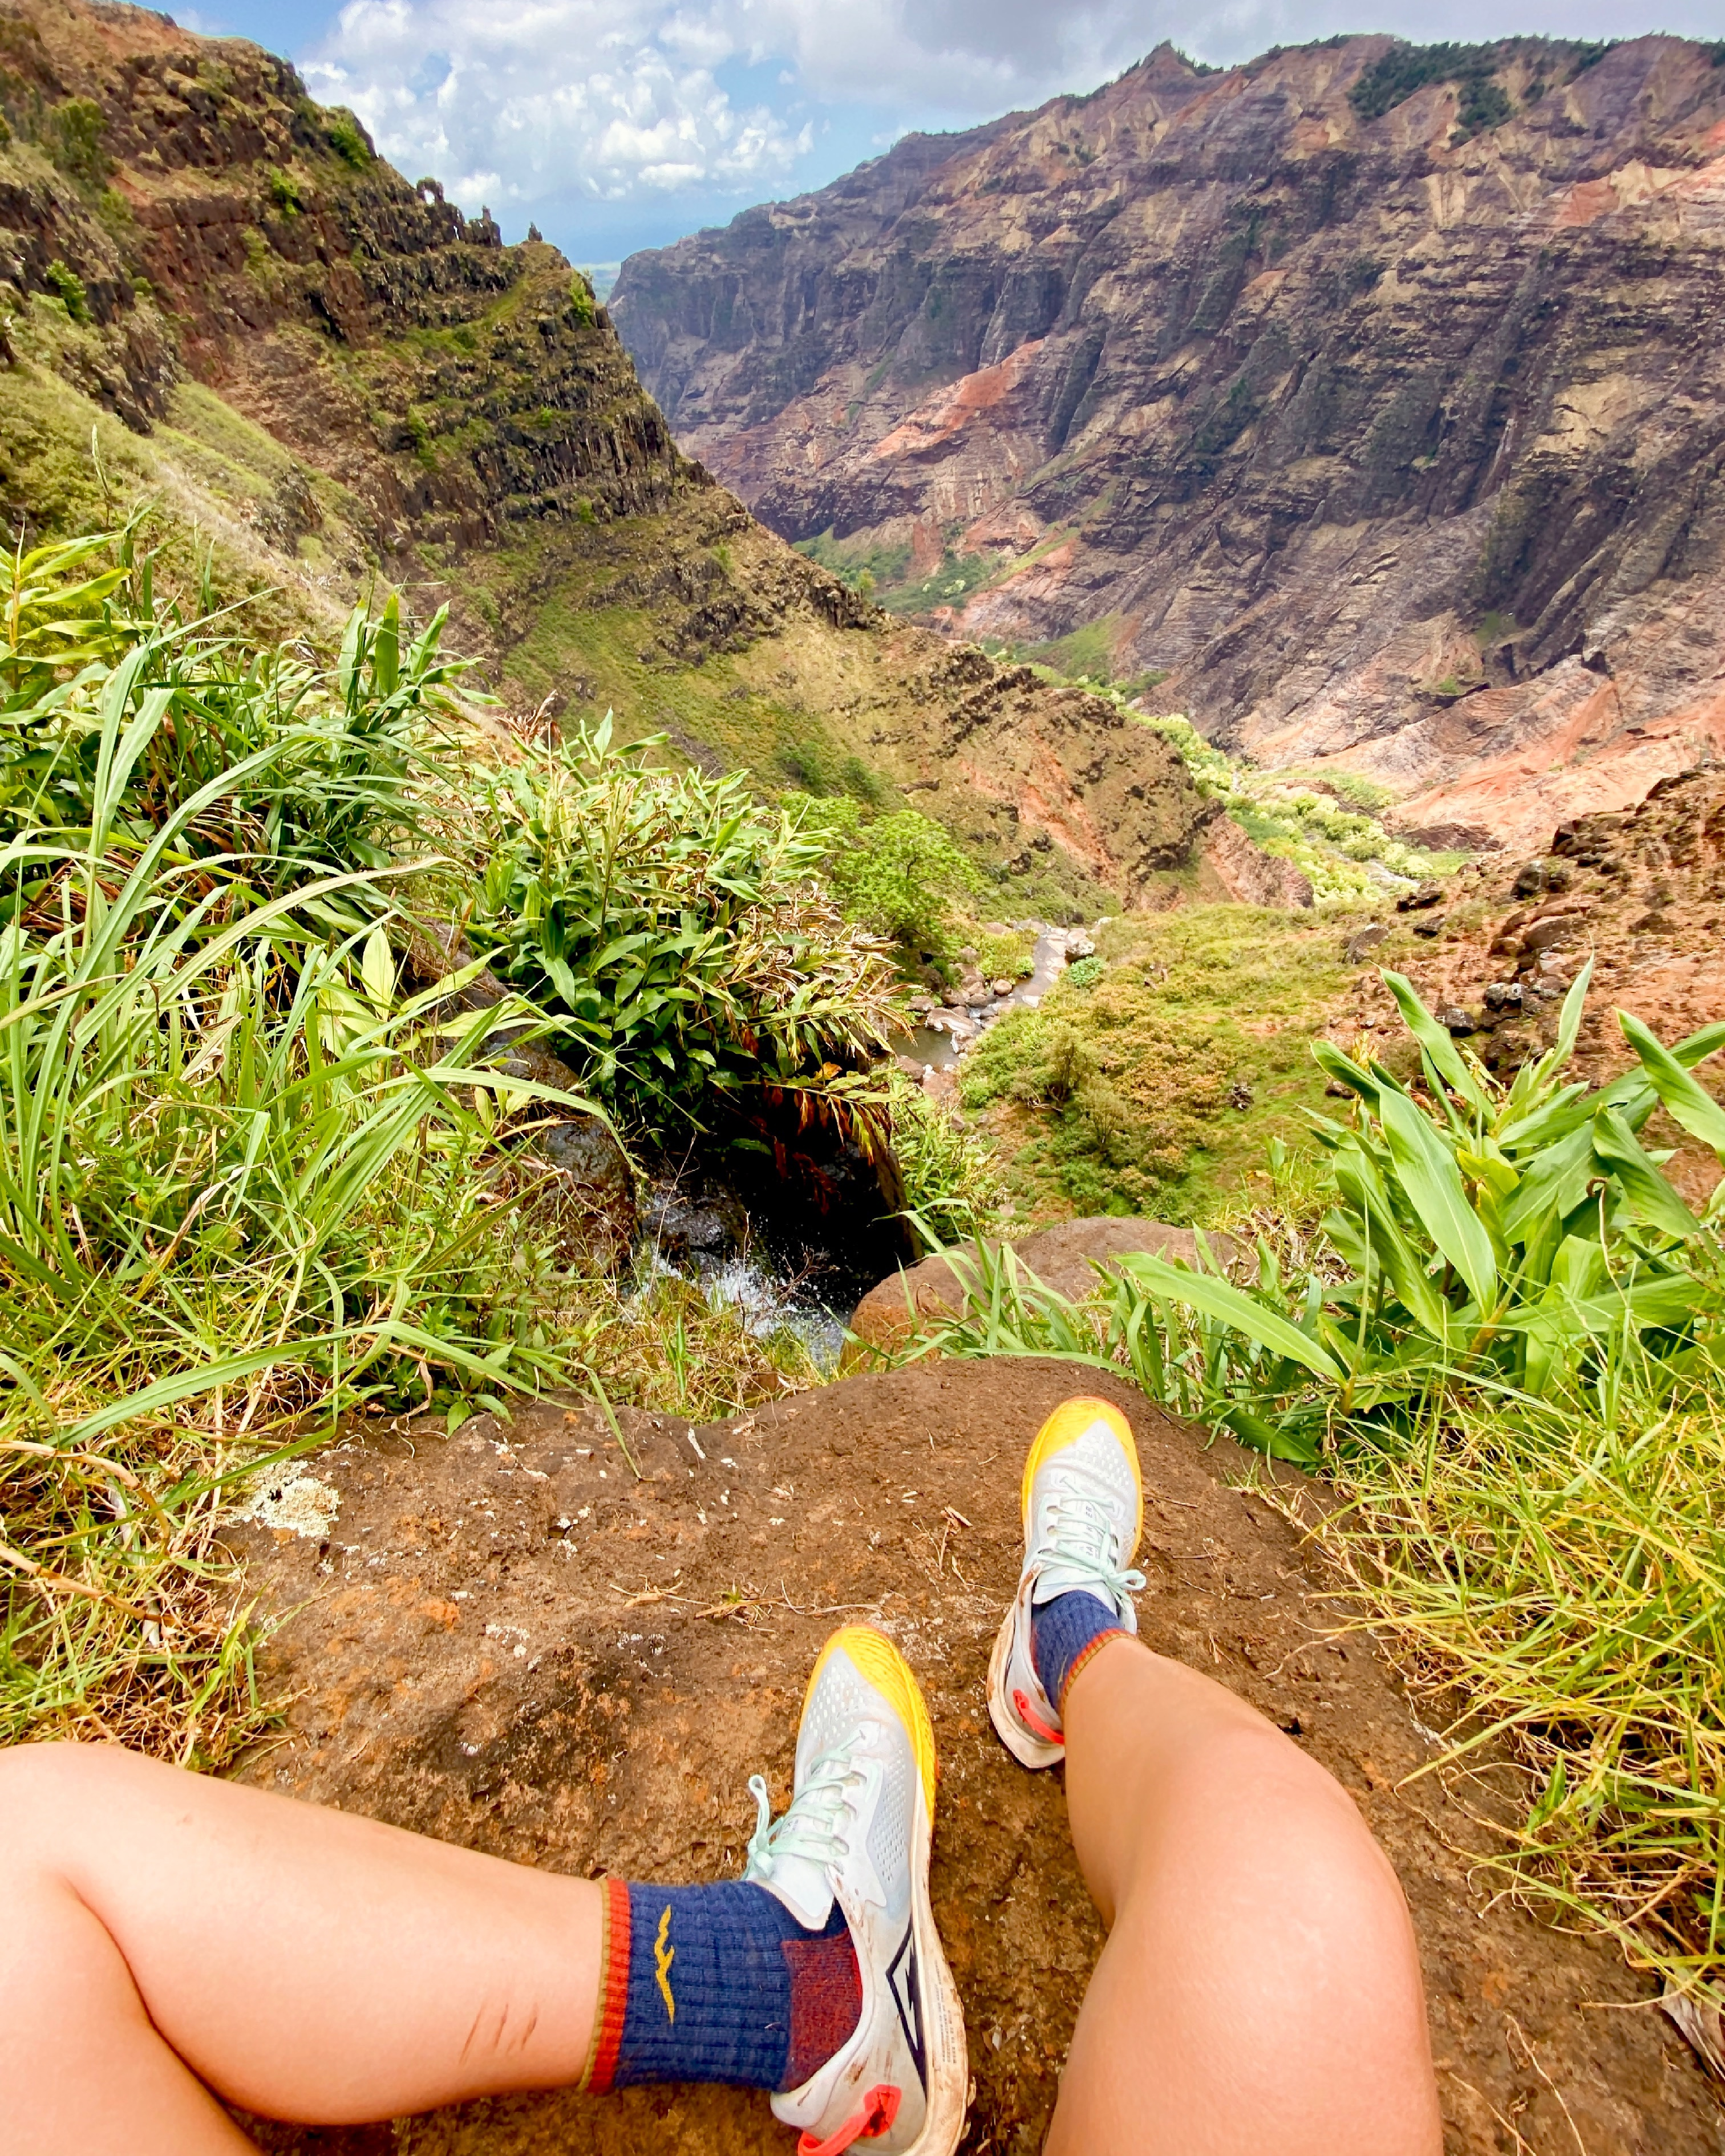 Waimea Canyon Trail - The Perfect 7-Day Kauai Itinerary - TravelsWithElle